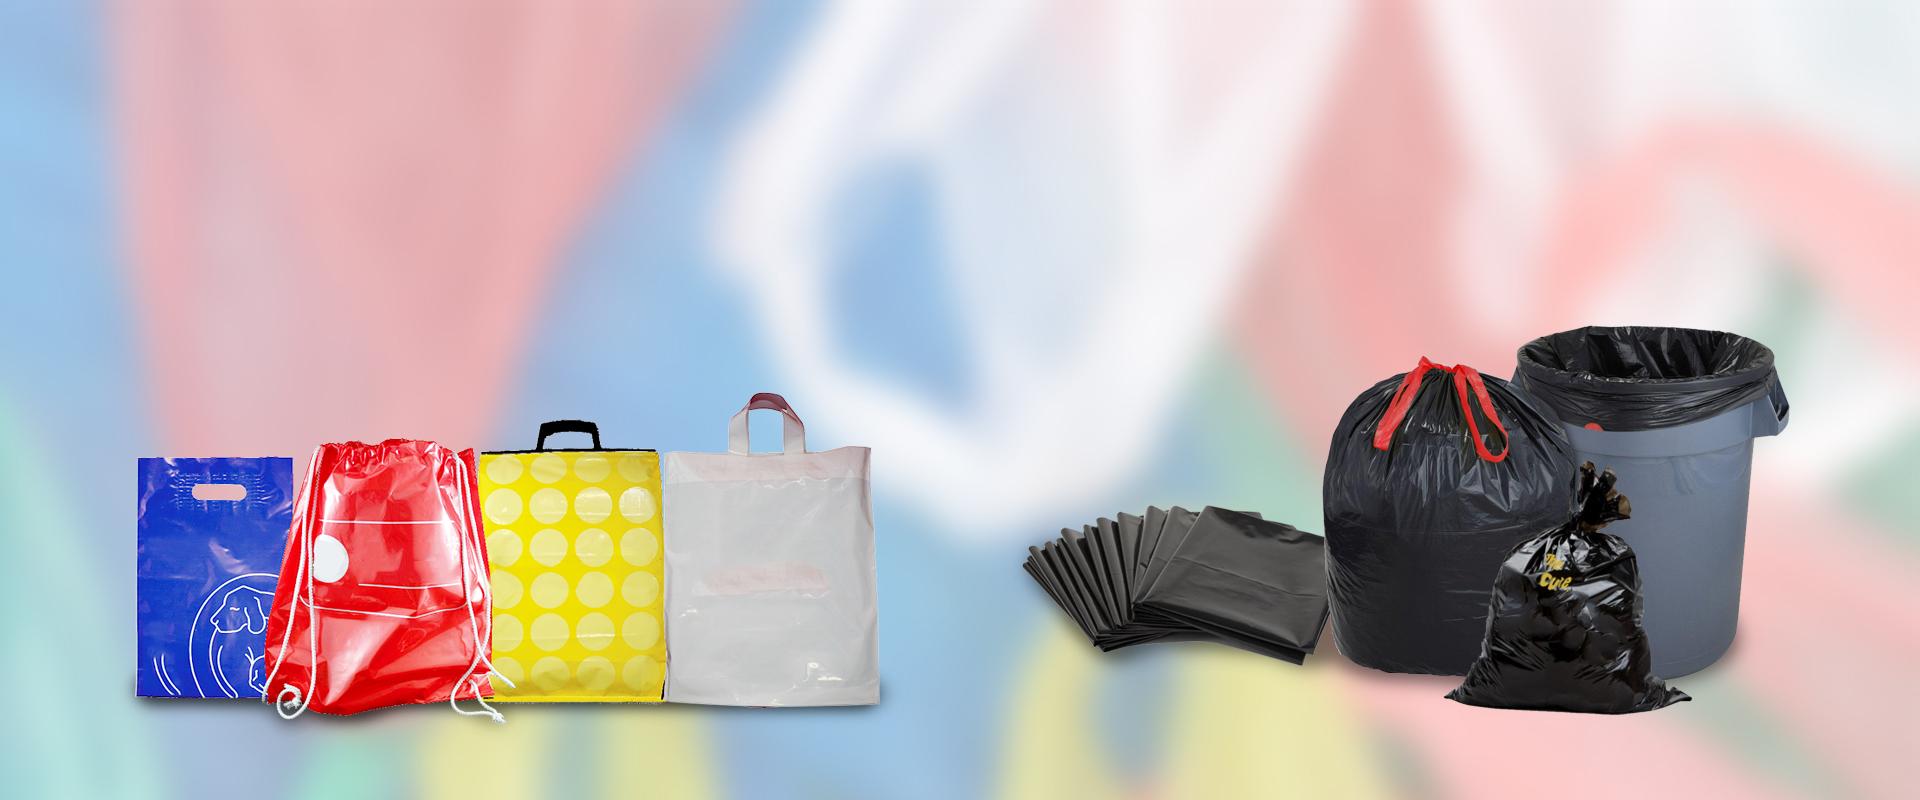 srsplasticbags